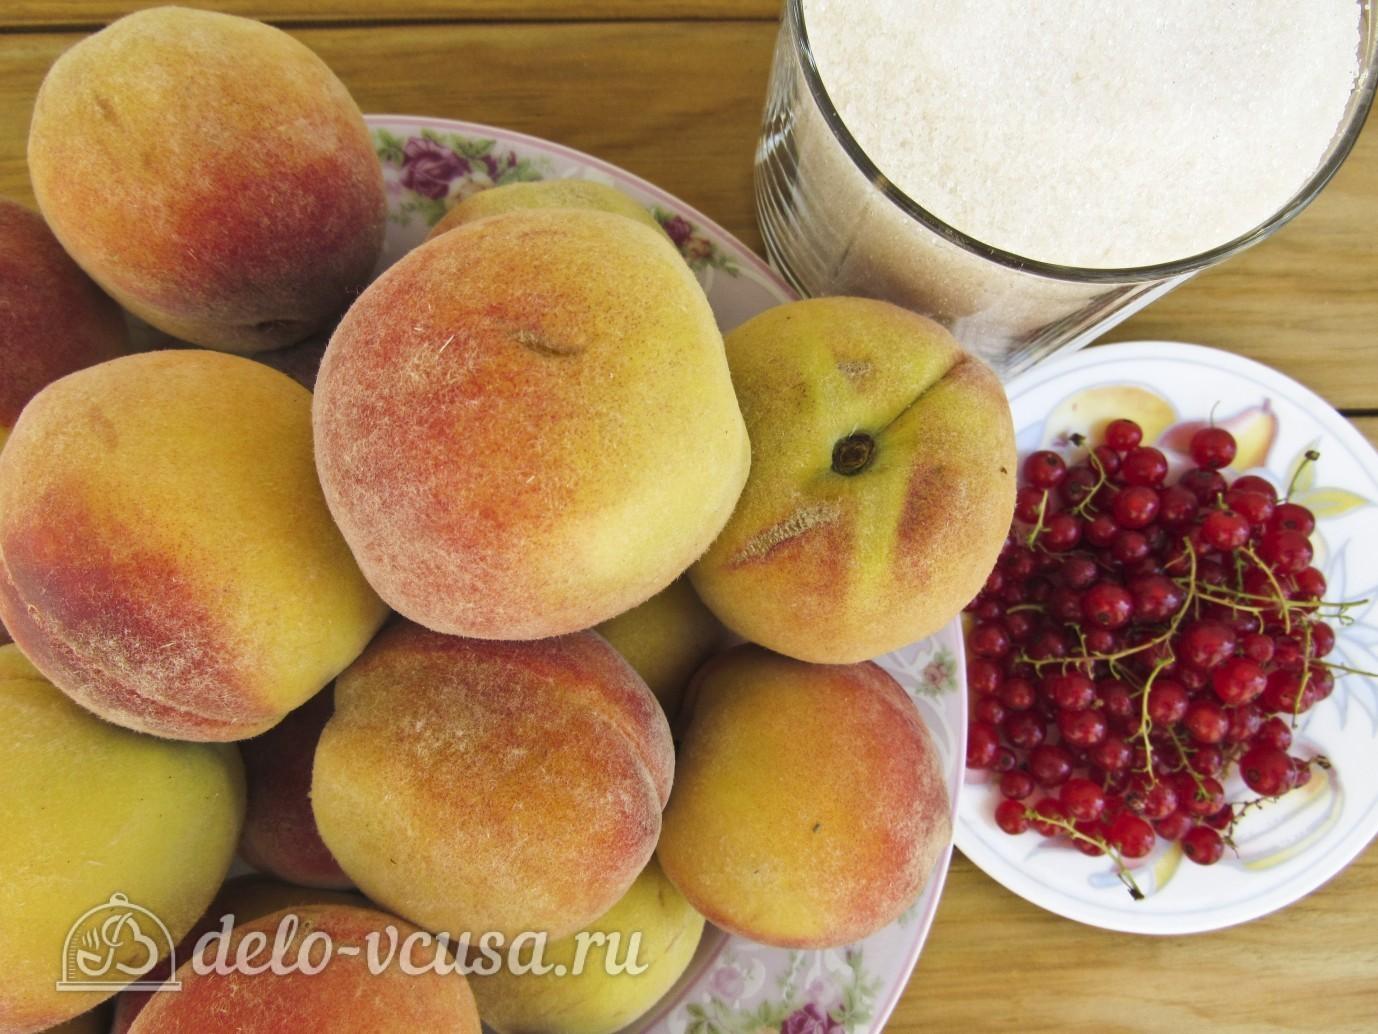 Компот из вишни рецепт